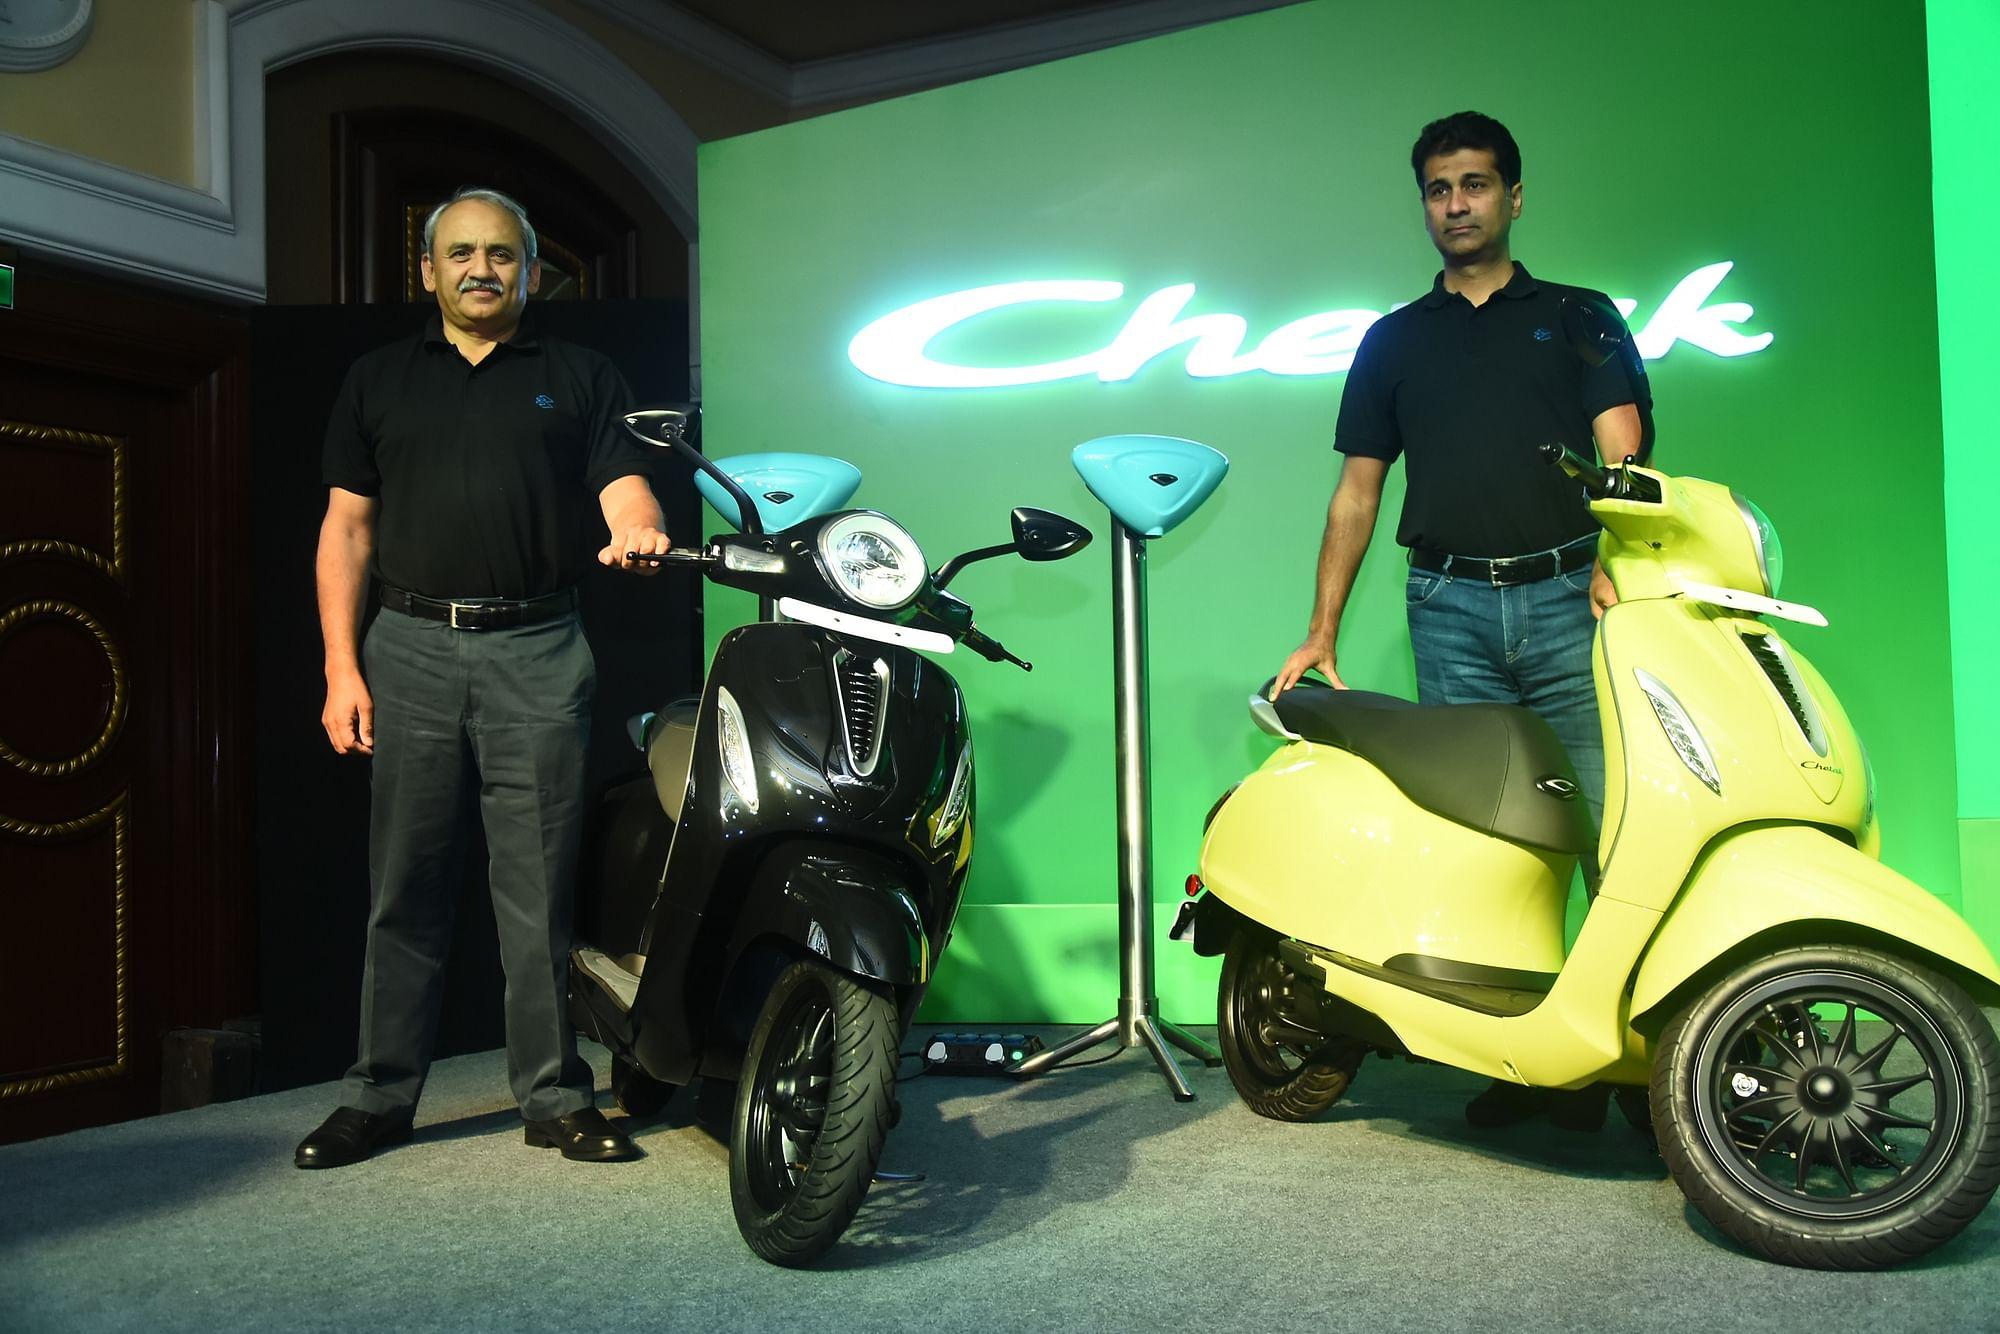 Bajaj Auto's Managing Director Rajiv Bajaj, right, and Executive Director Rakesh Sharma at the launch of the Bajaj Chetal electric scooter in Mumbai, India, on Tuesday, Jan 14., 2020. (Photo: Bajaj Auto)